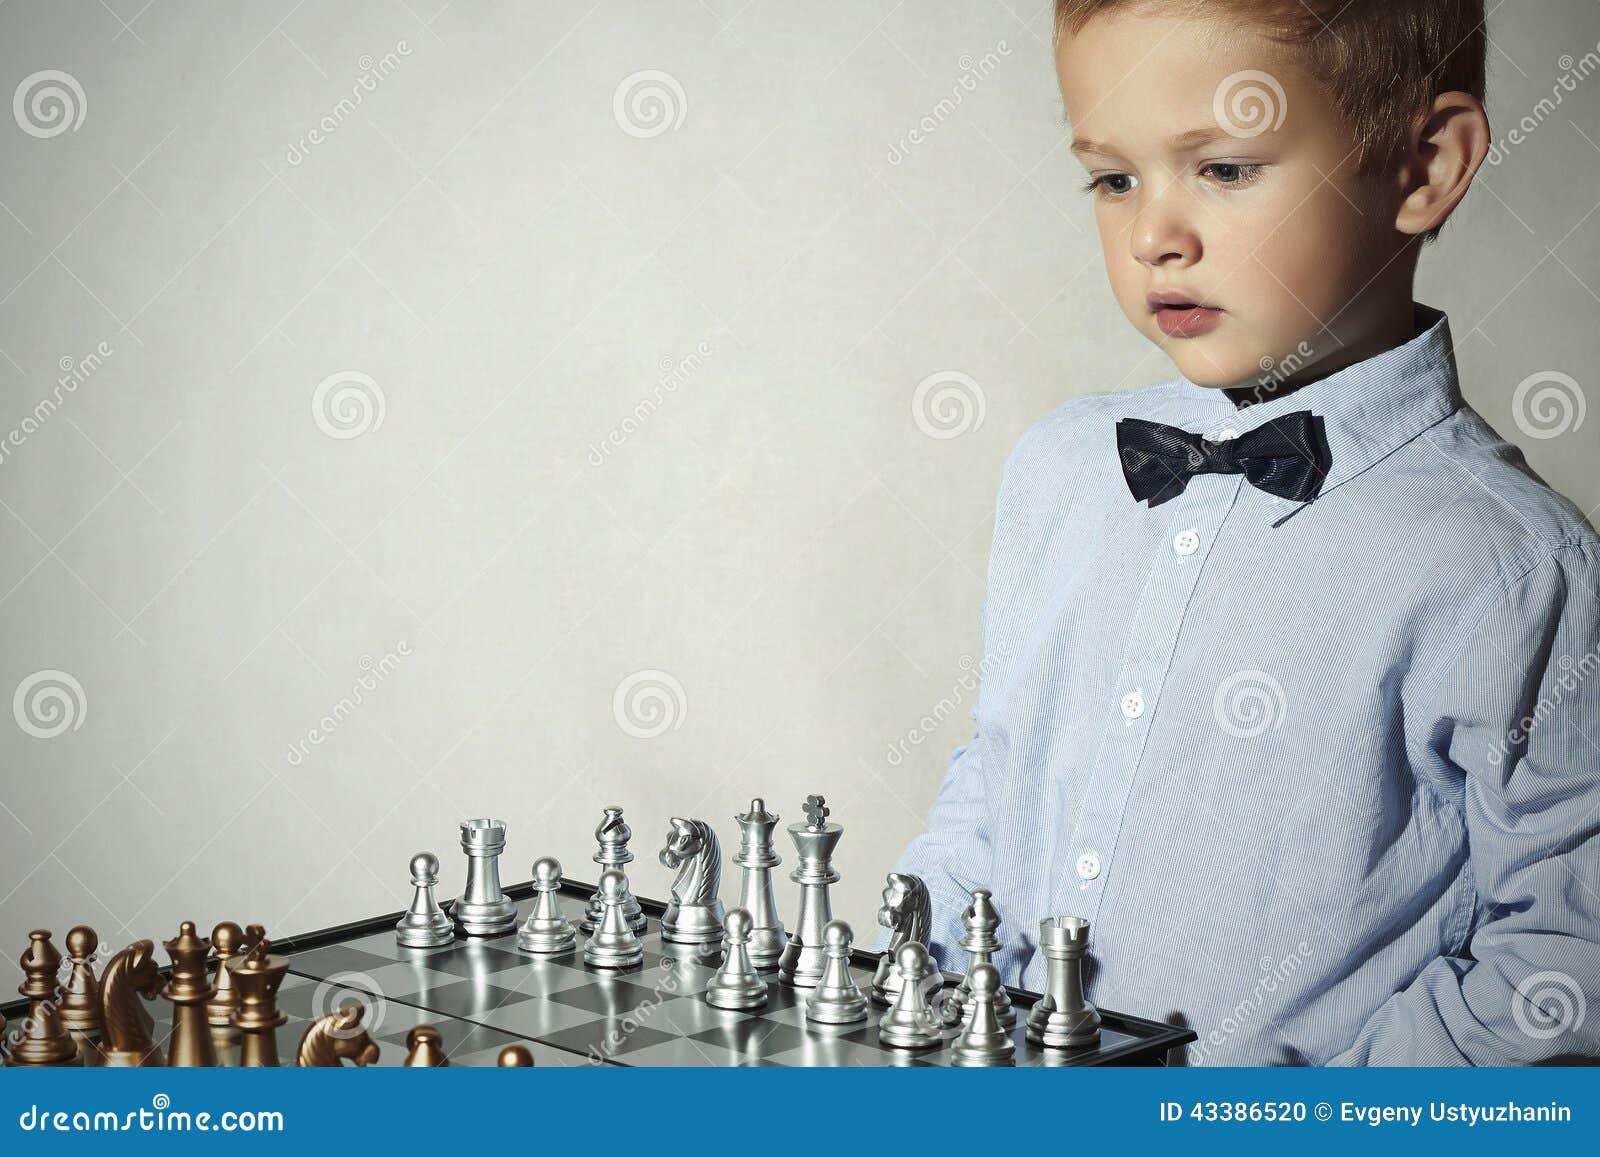 how to create a child genius